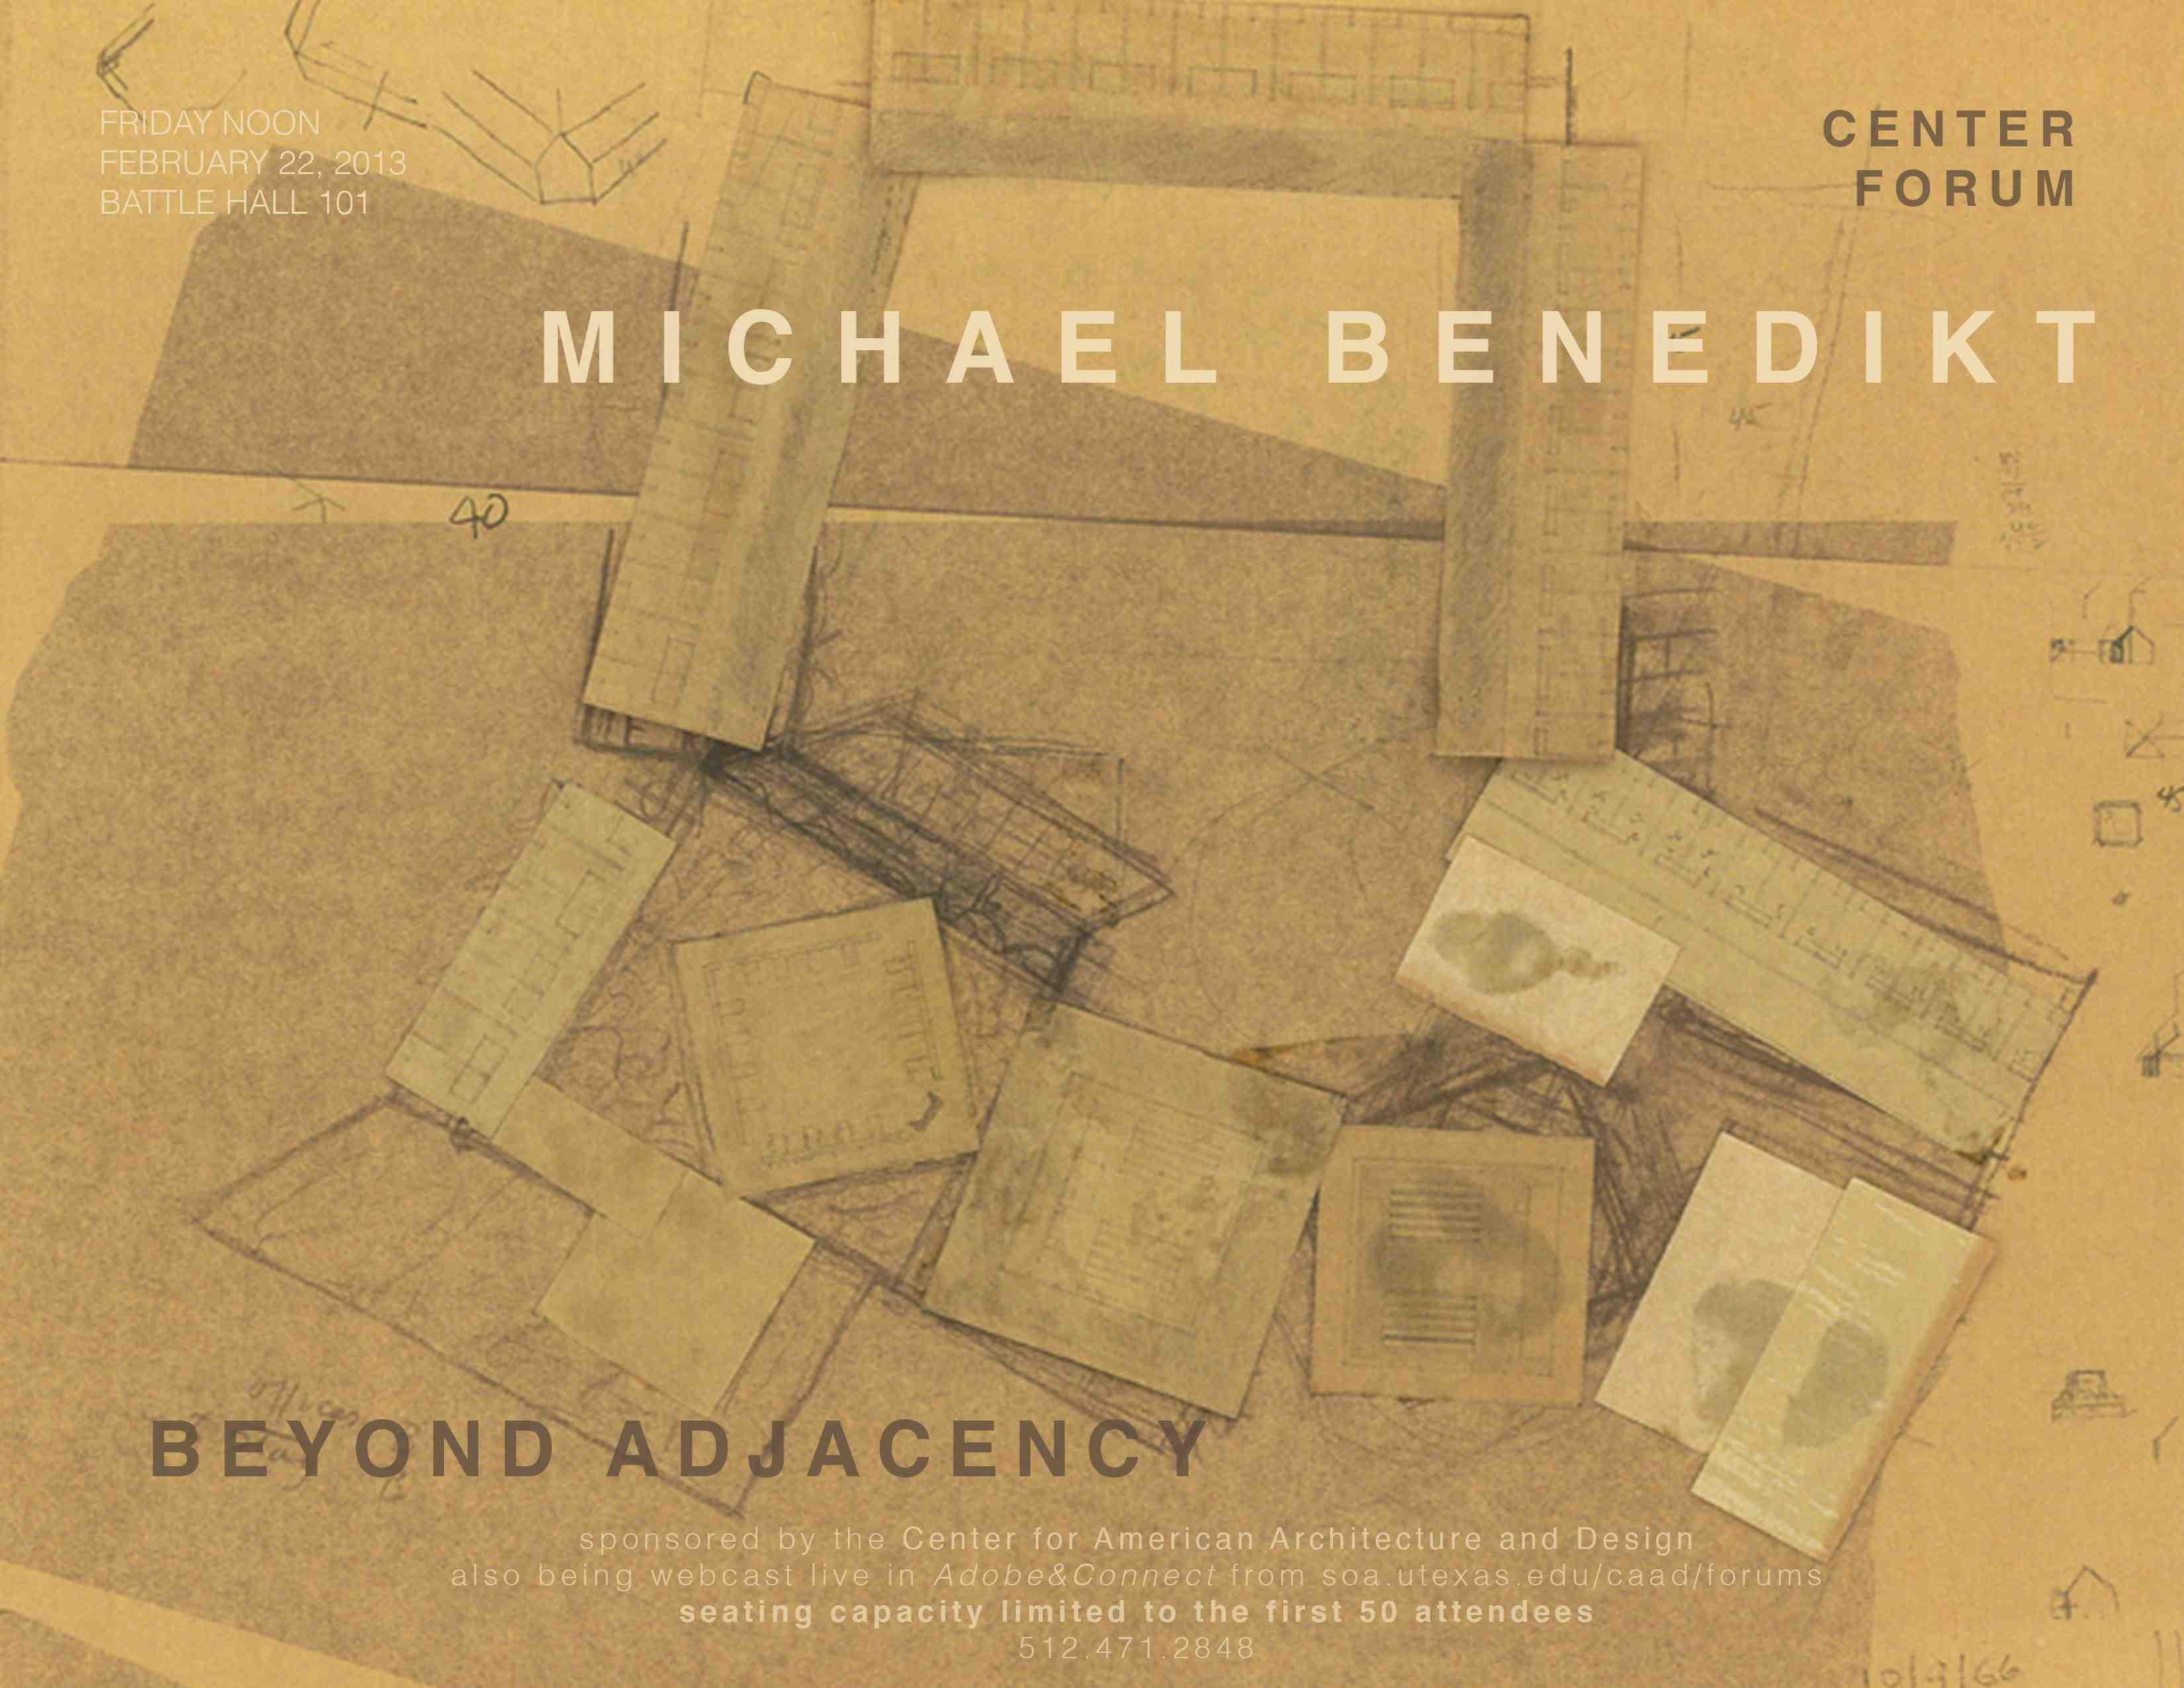 Michael Benedikt - Beyond Adjacency